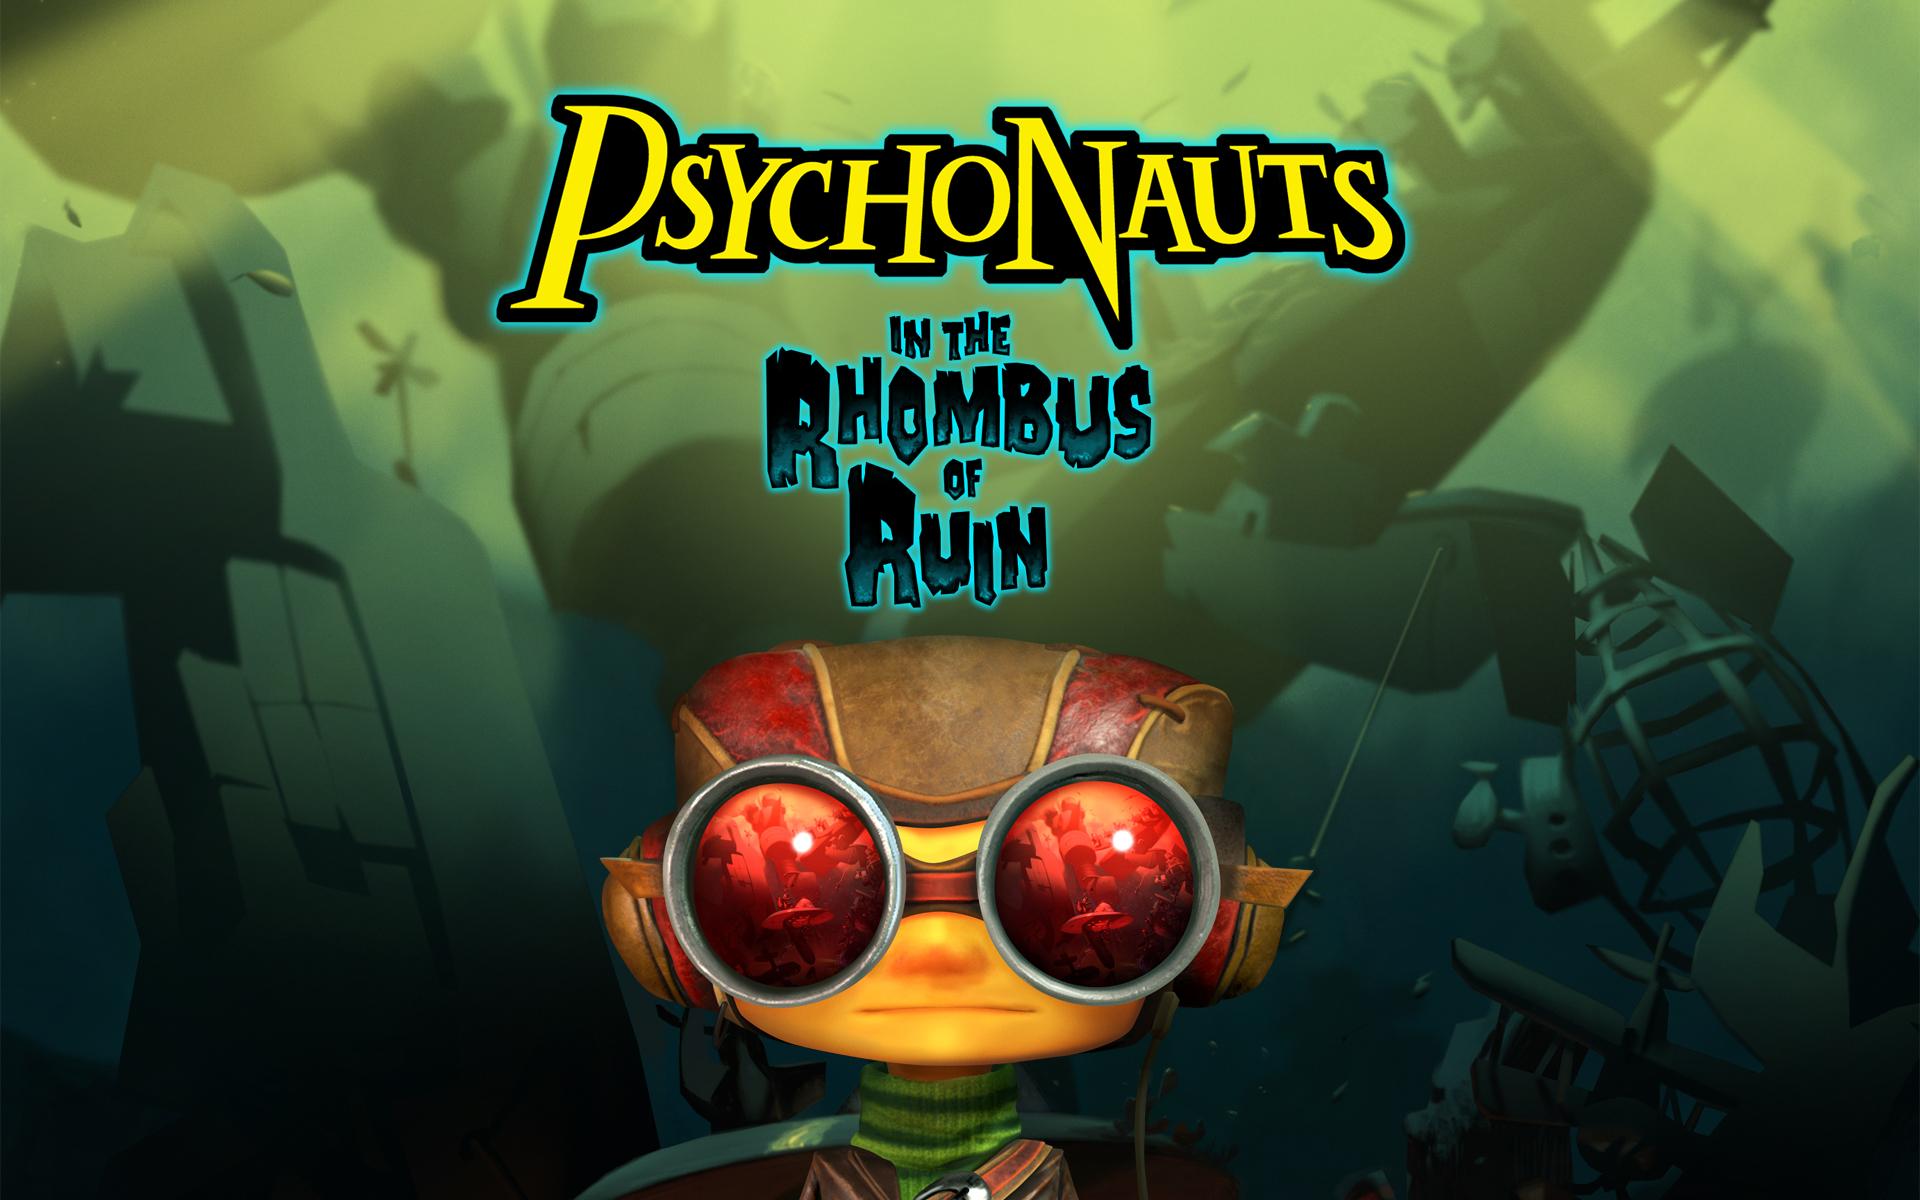 psychonauts video game wallpaper 67573